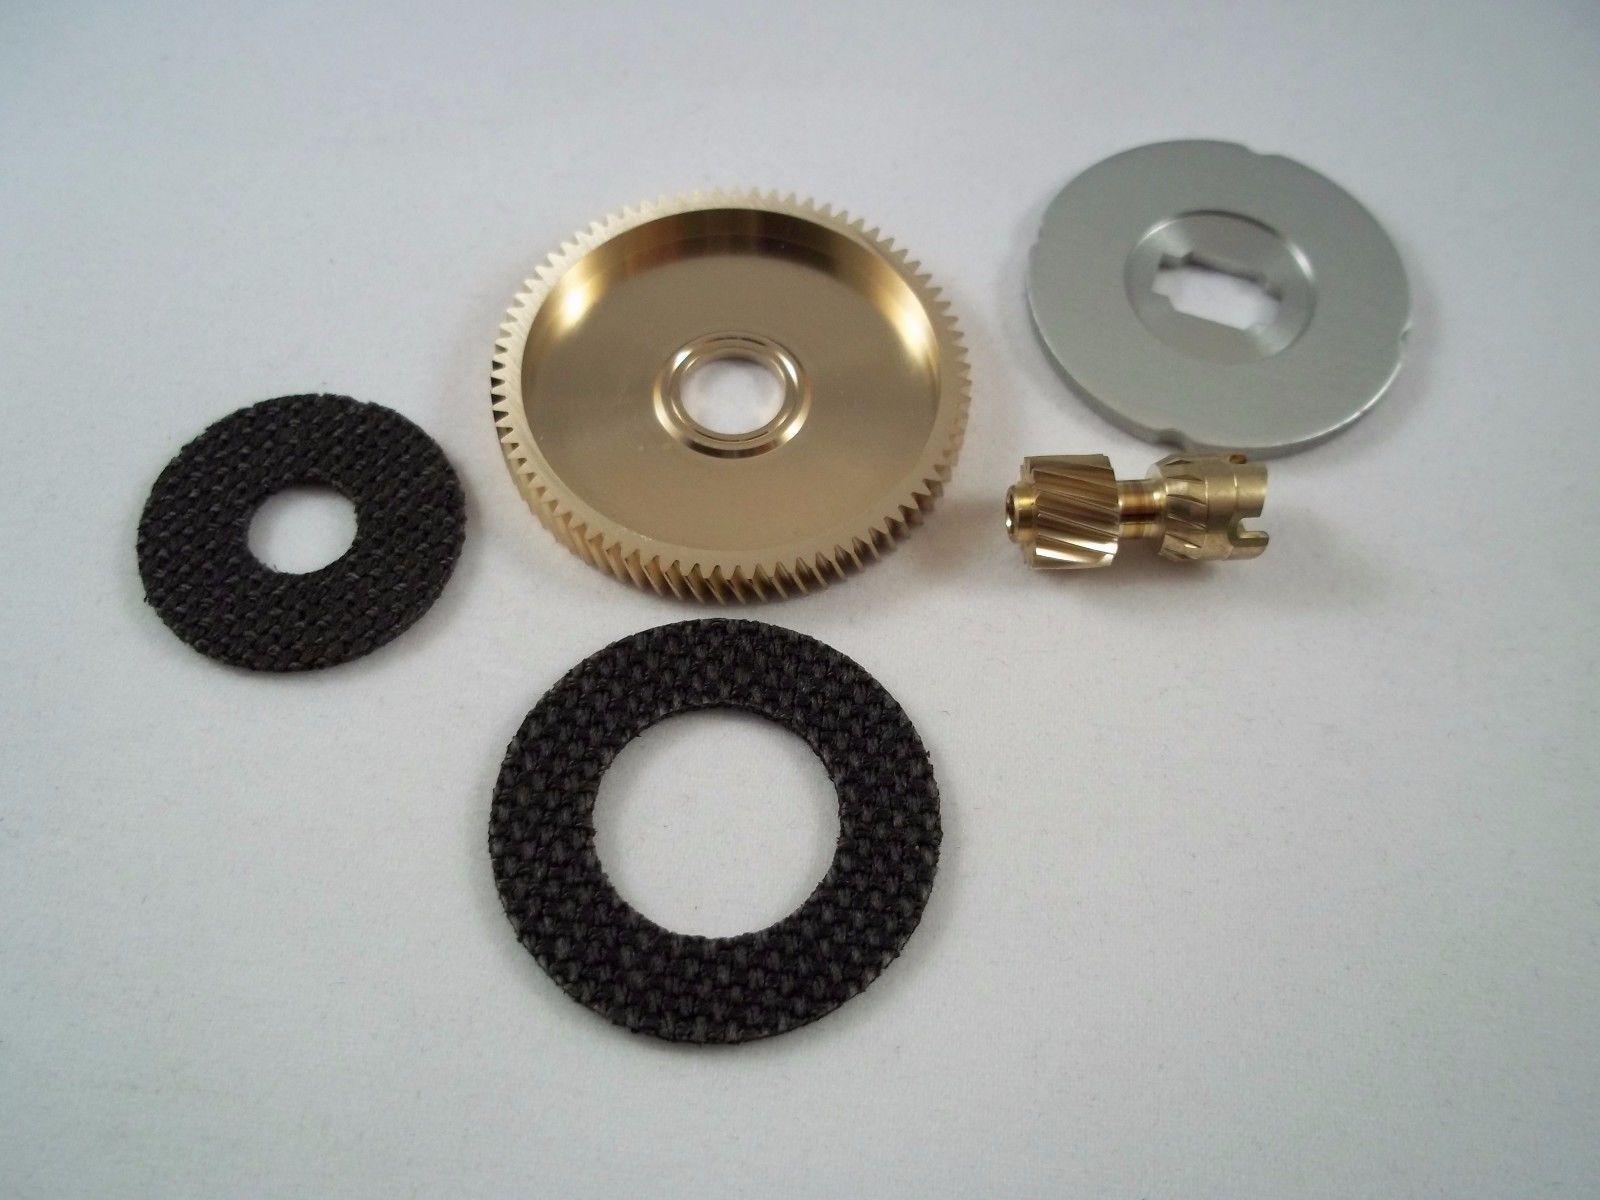 Reel Parts and Repair 178885: New Shimano Reel Part Drive